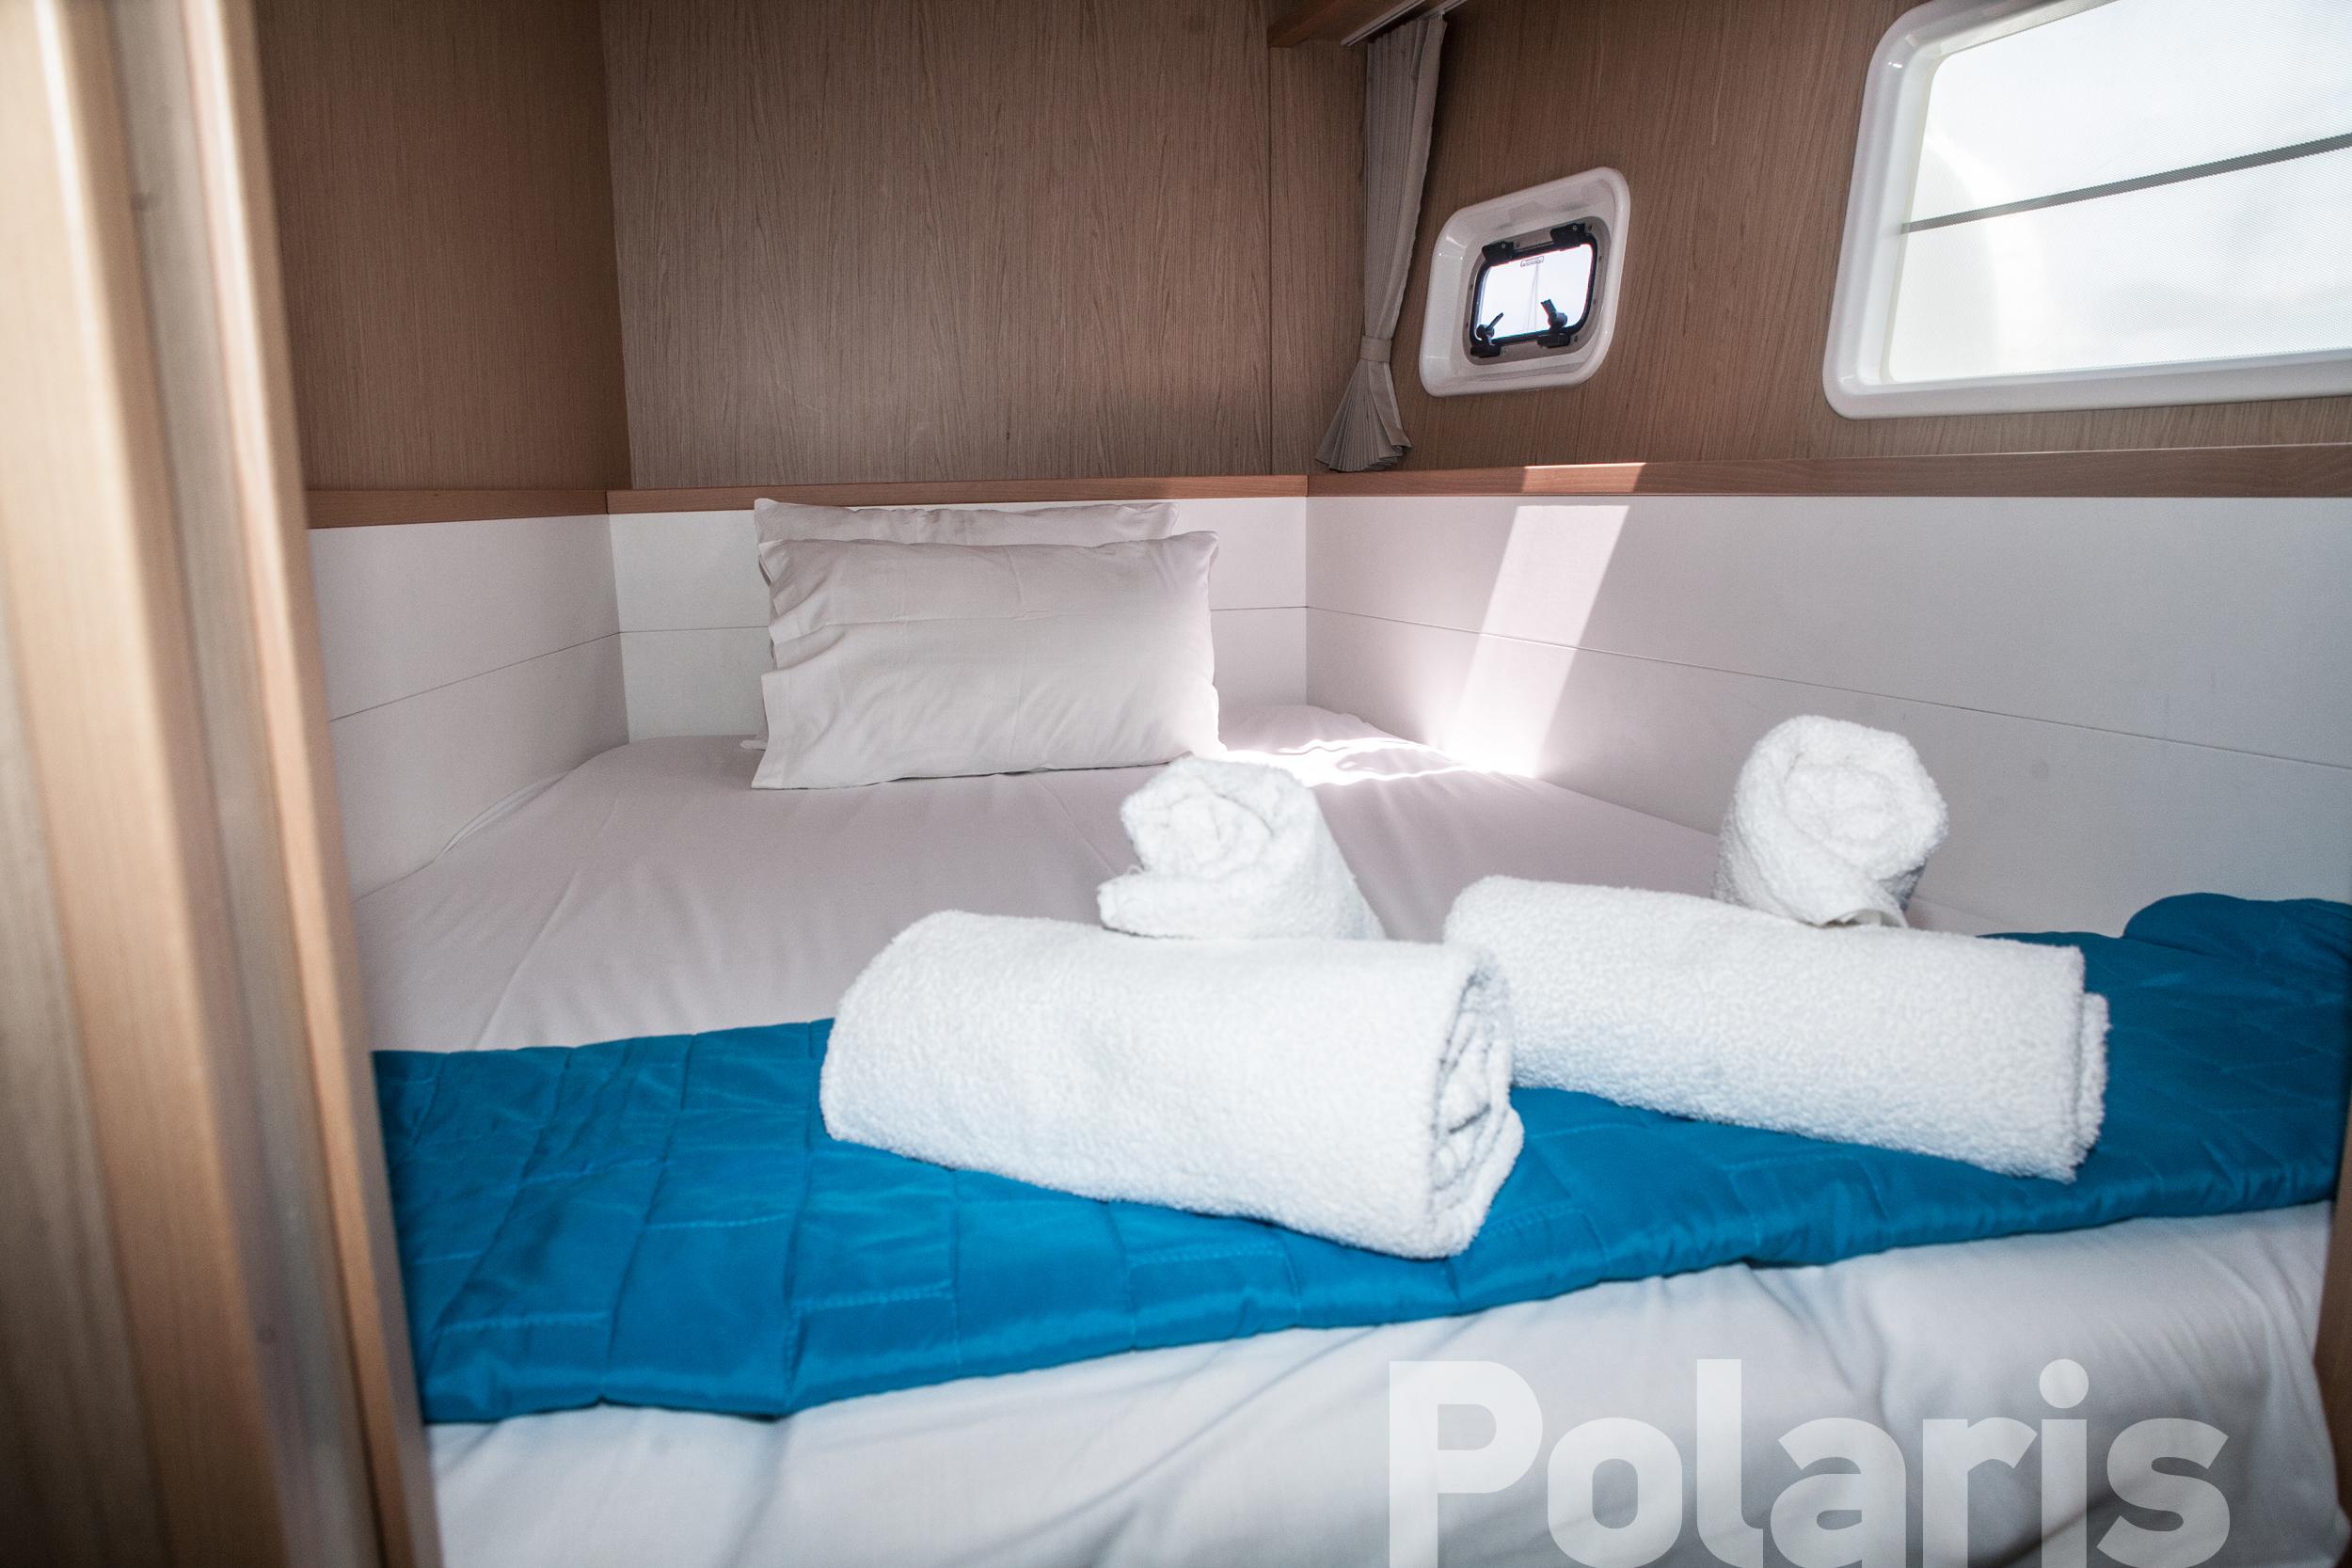 Polaris II